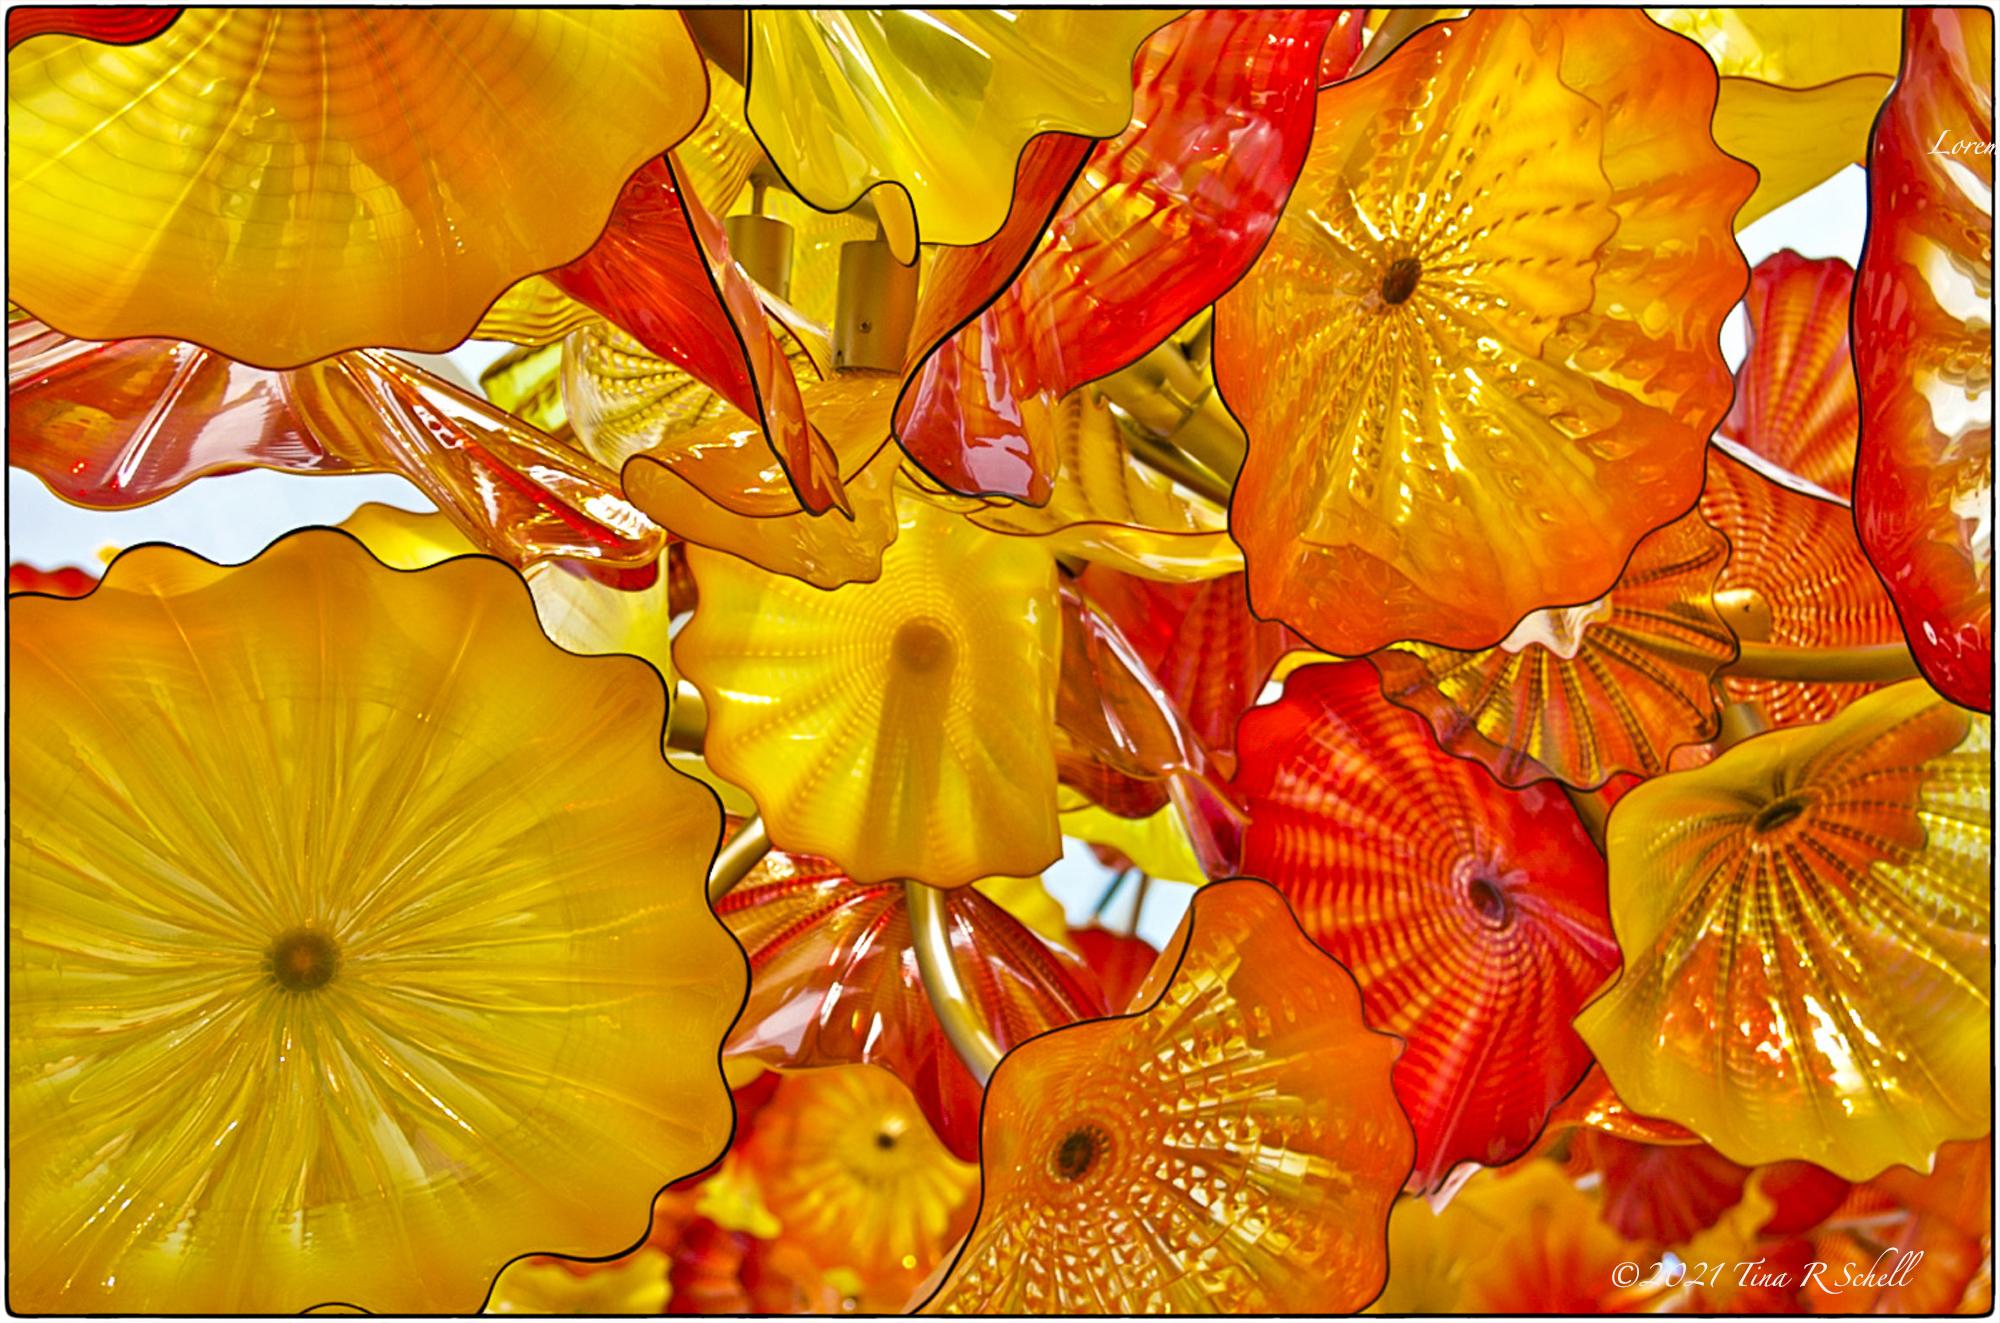 chihuly, glass, orange, yellow